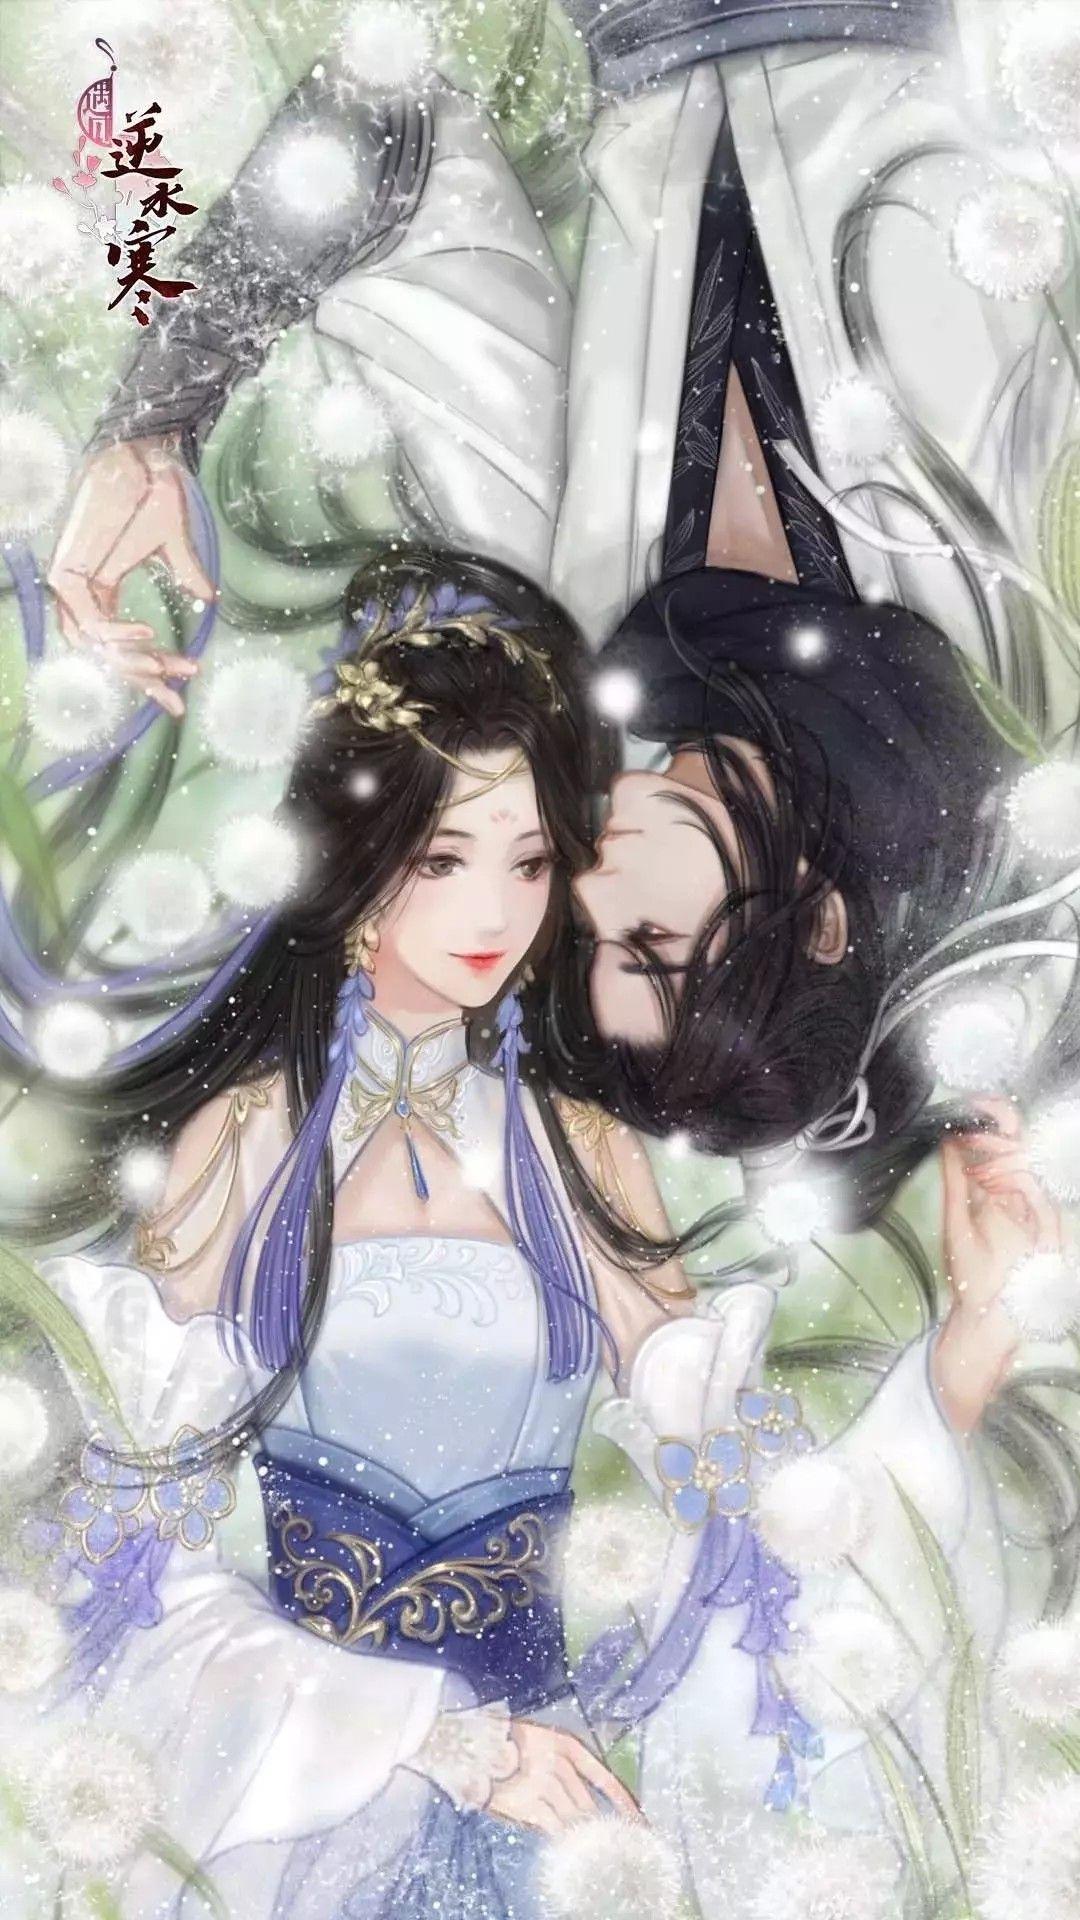 mnizoe184 Cre On pic trong 2020 Nghệ thuật anime, Minh